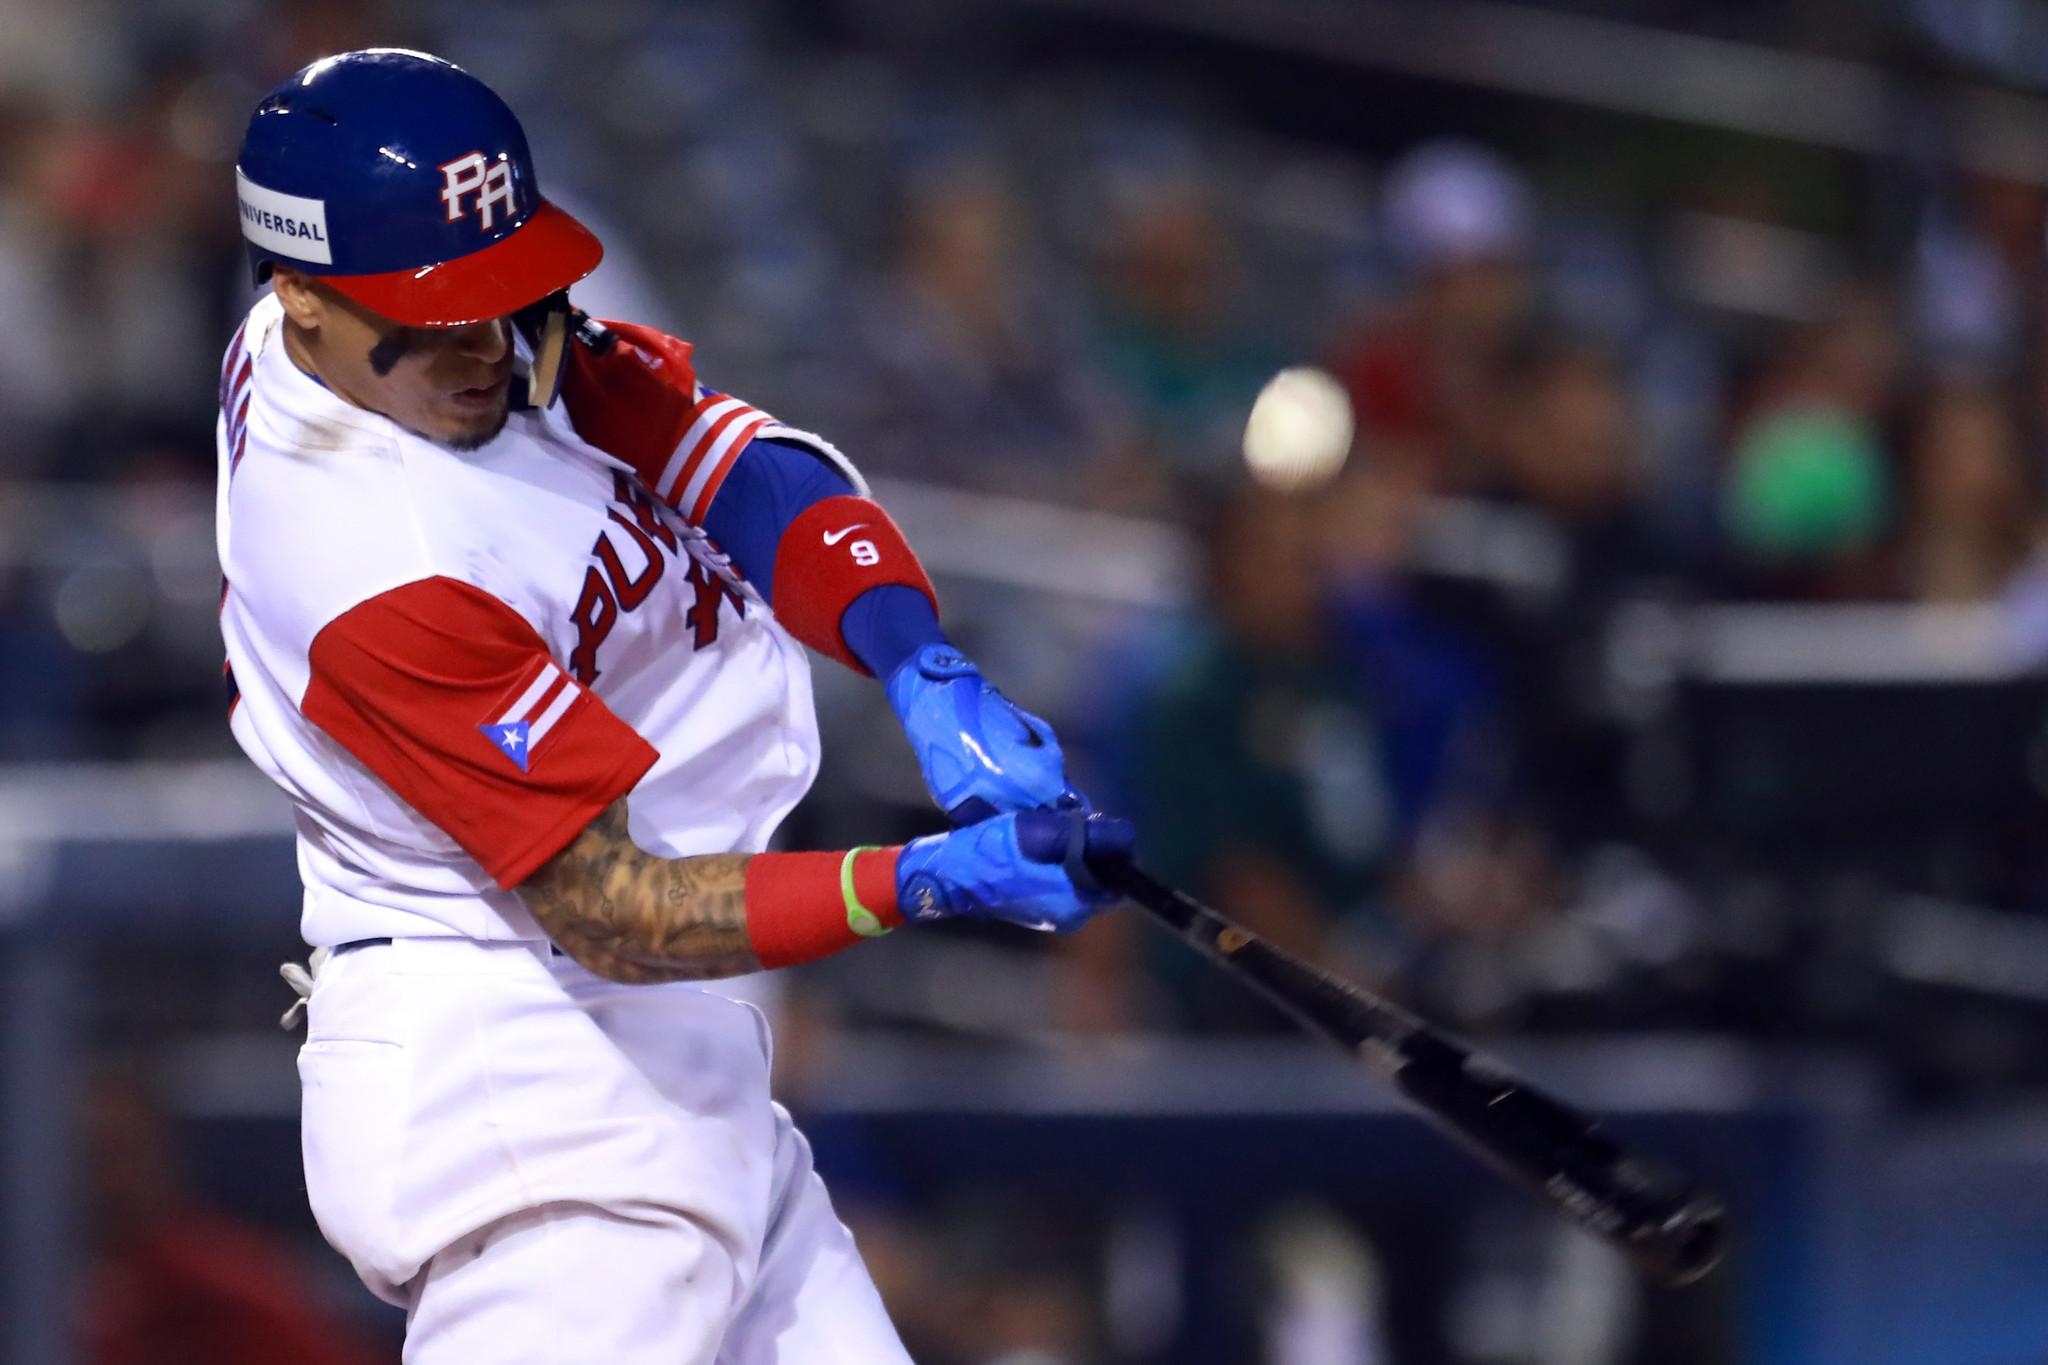 Cubs Javier Baez Helps Puerto Rico Advance In World